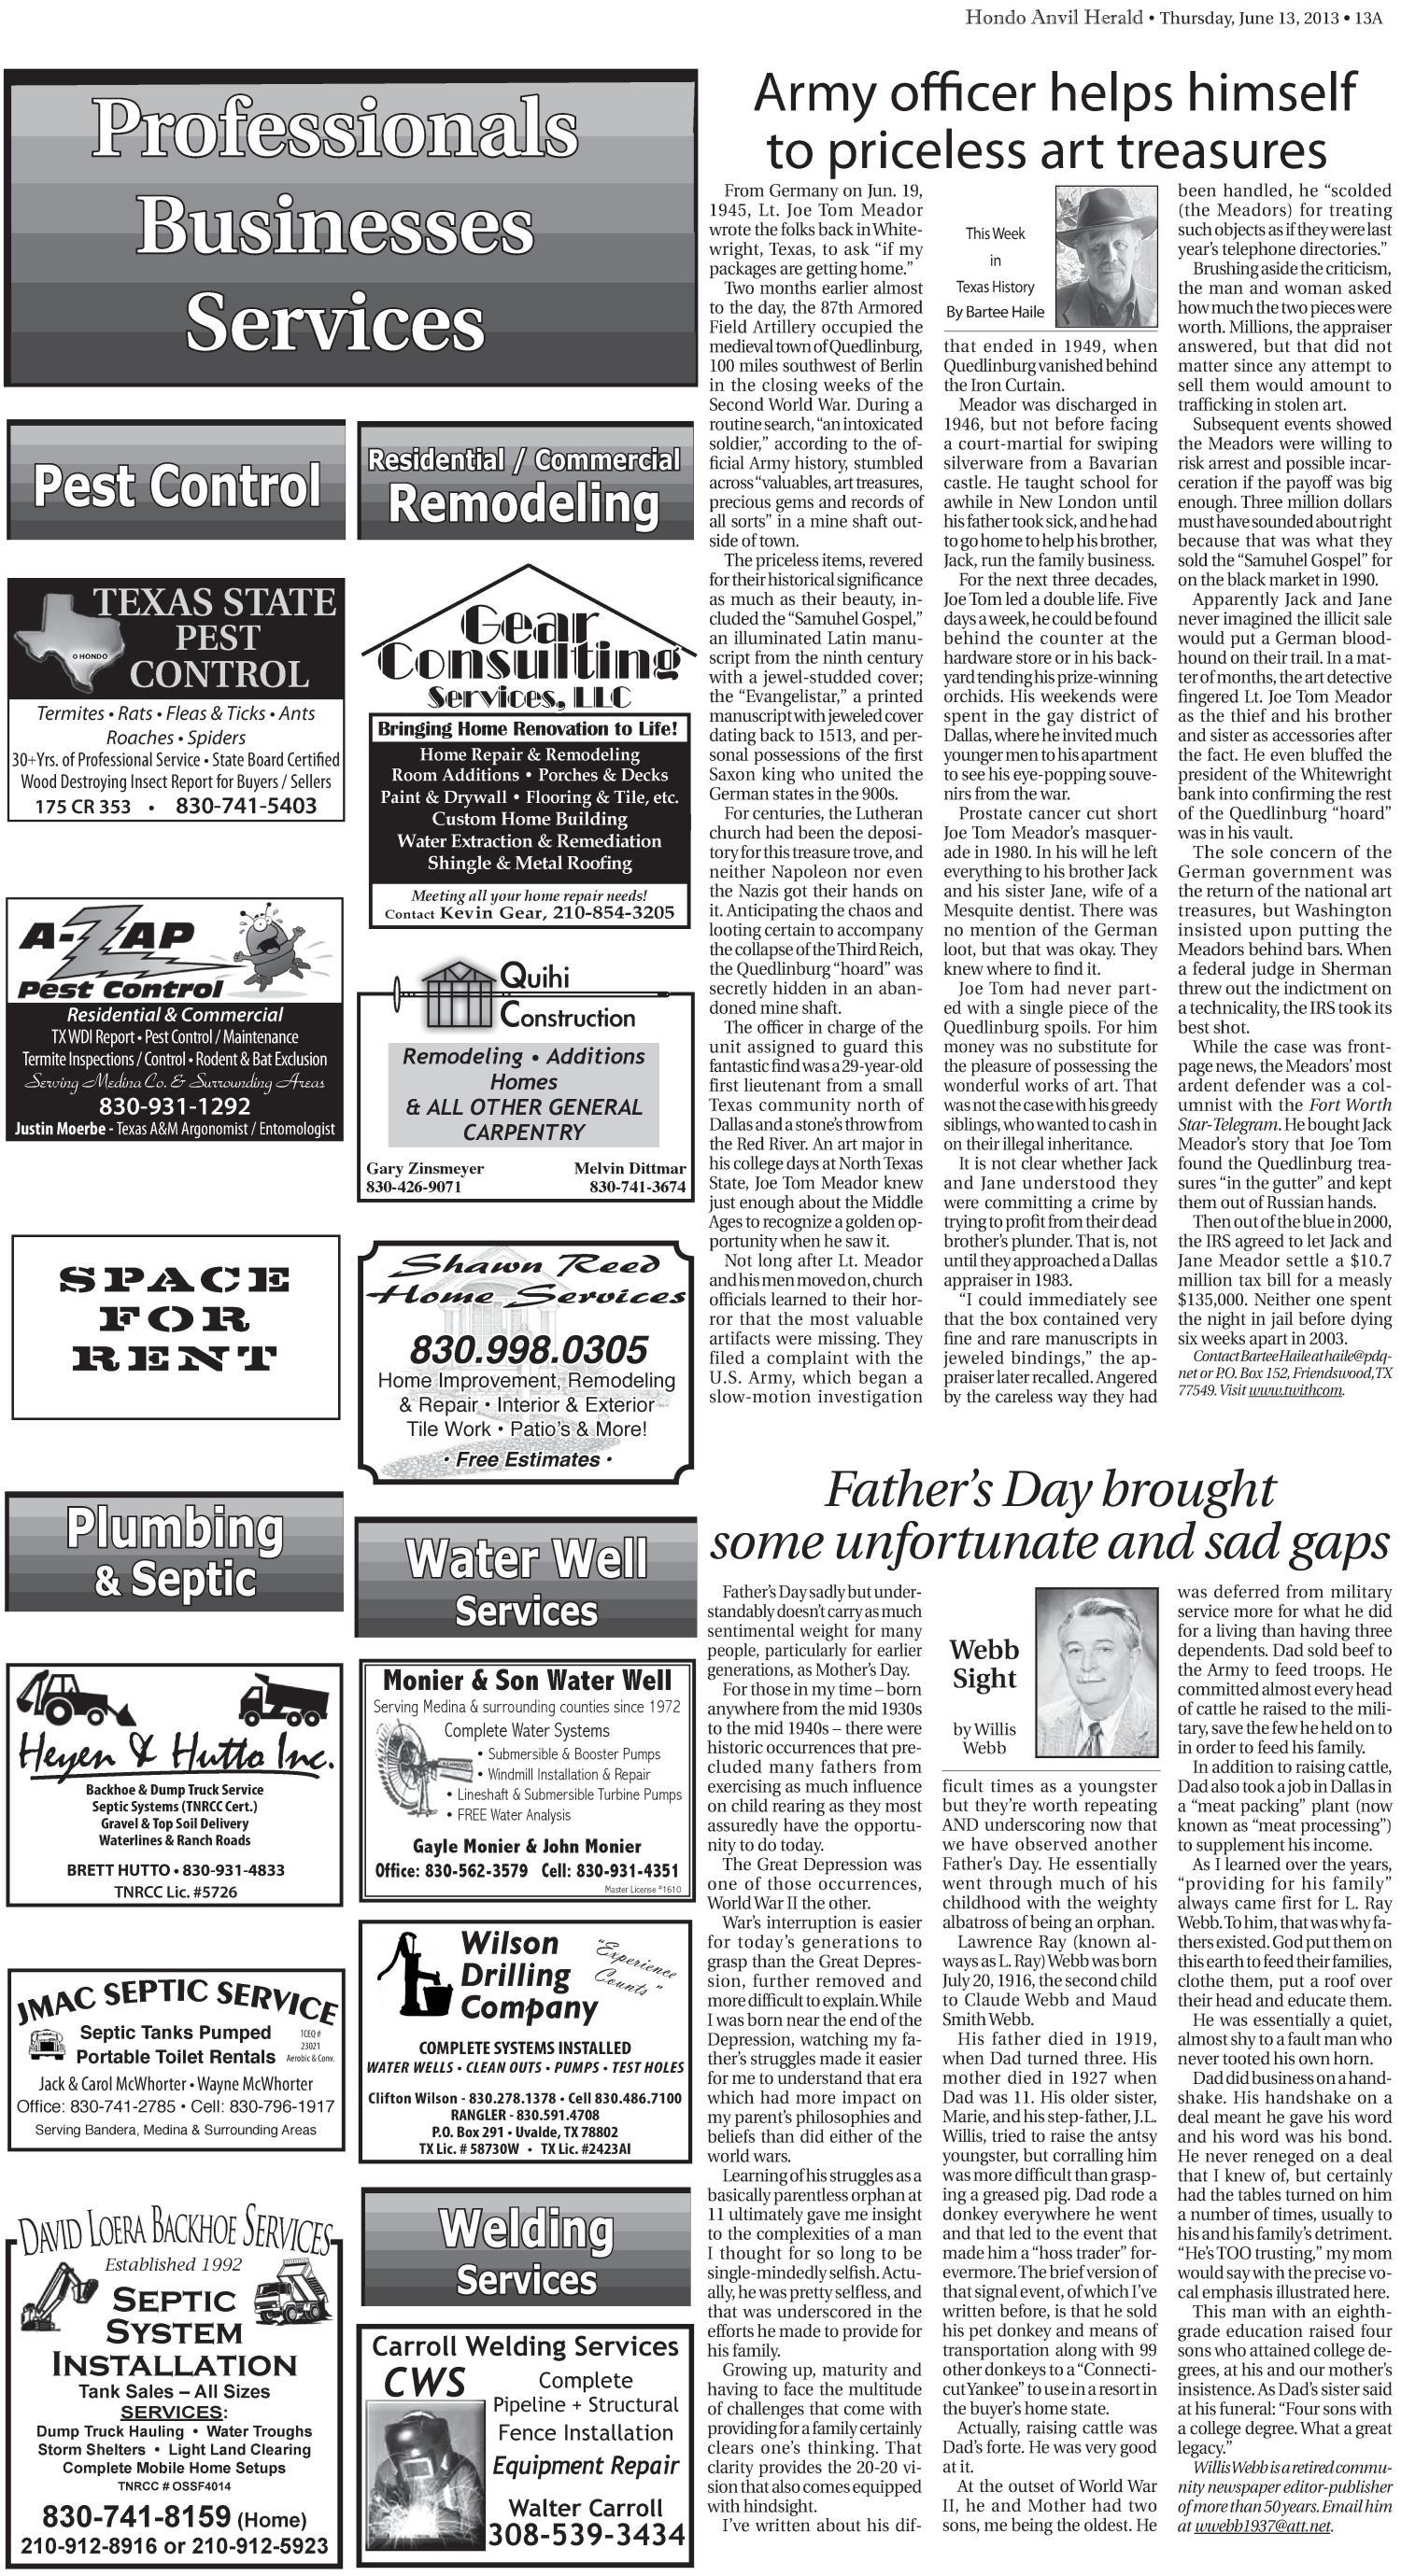 Hondo Anvil Herald (Hondo, Tex ), Vol  127, No  25, Ed  1 Thursday